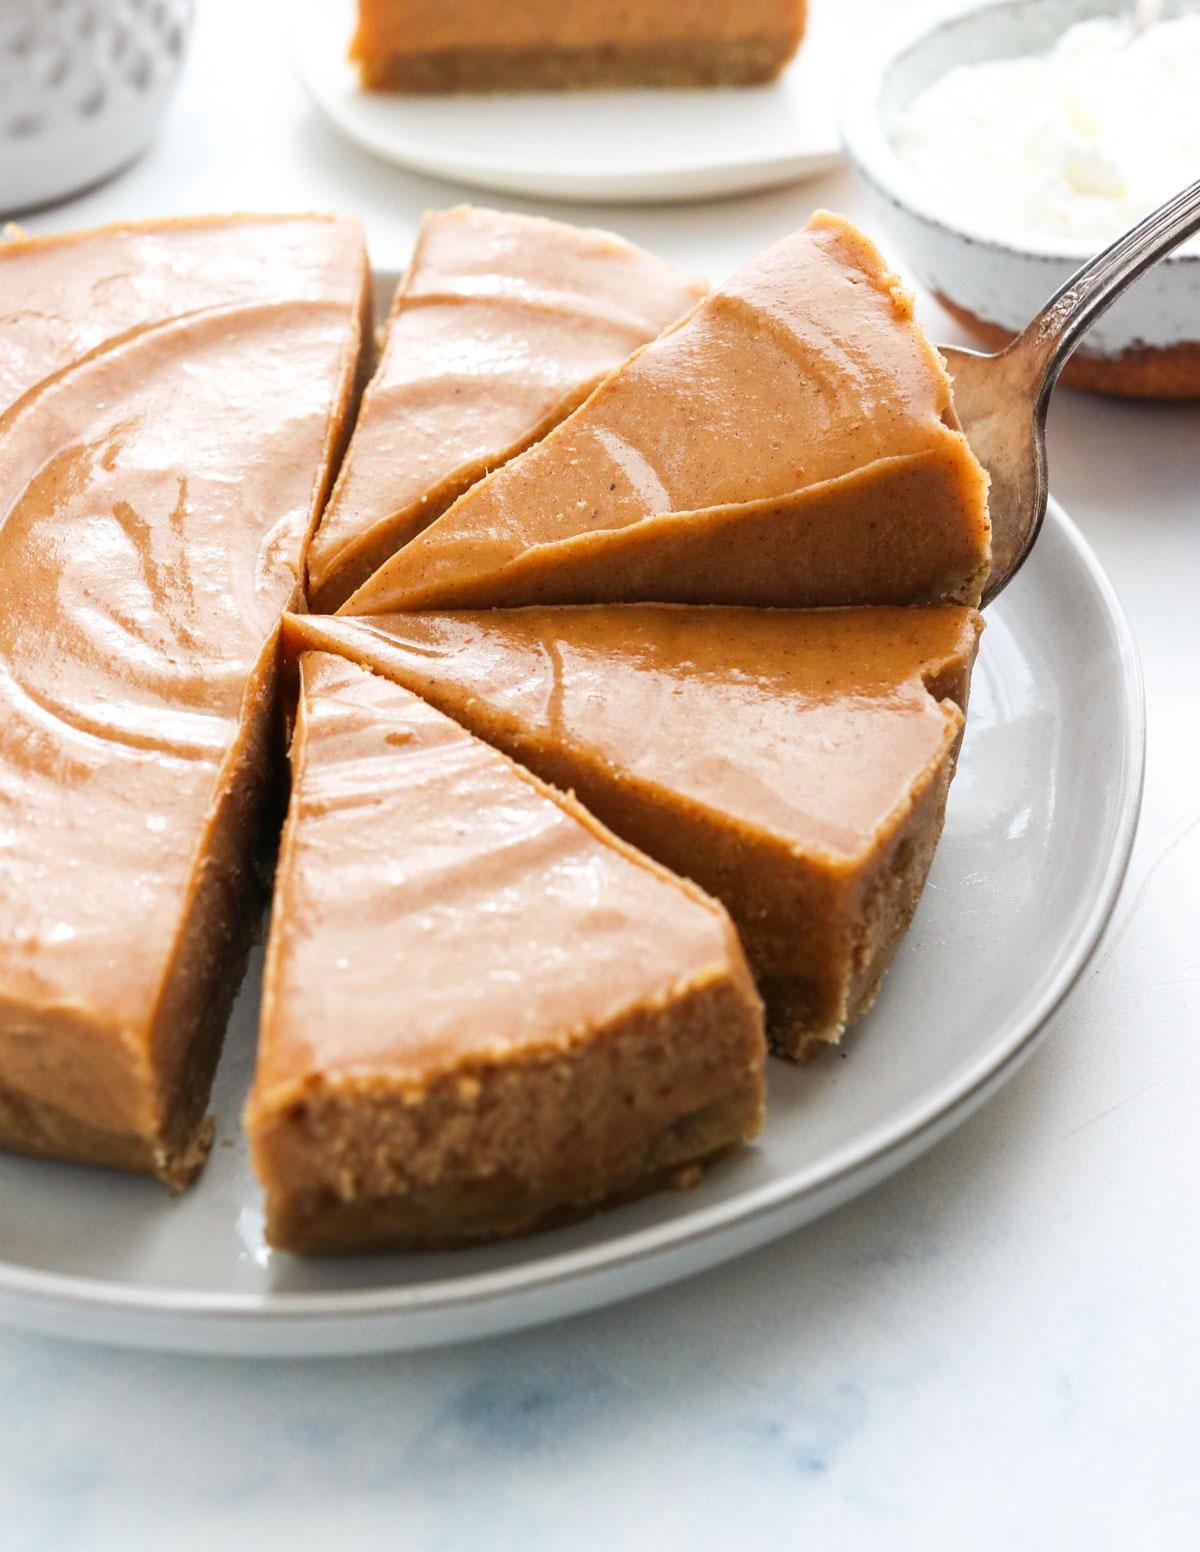 sliced pumpkin cheesecake lifted up